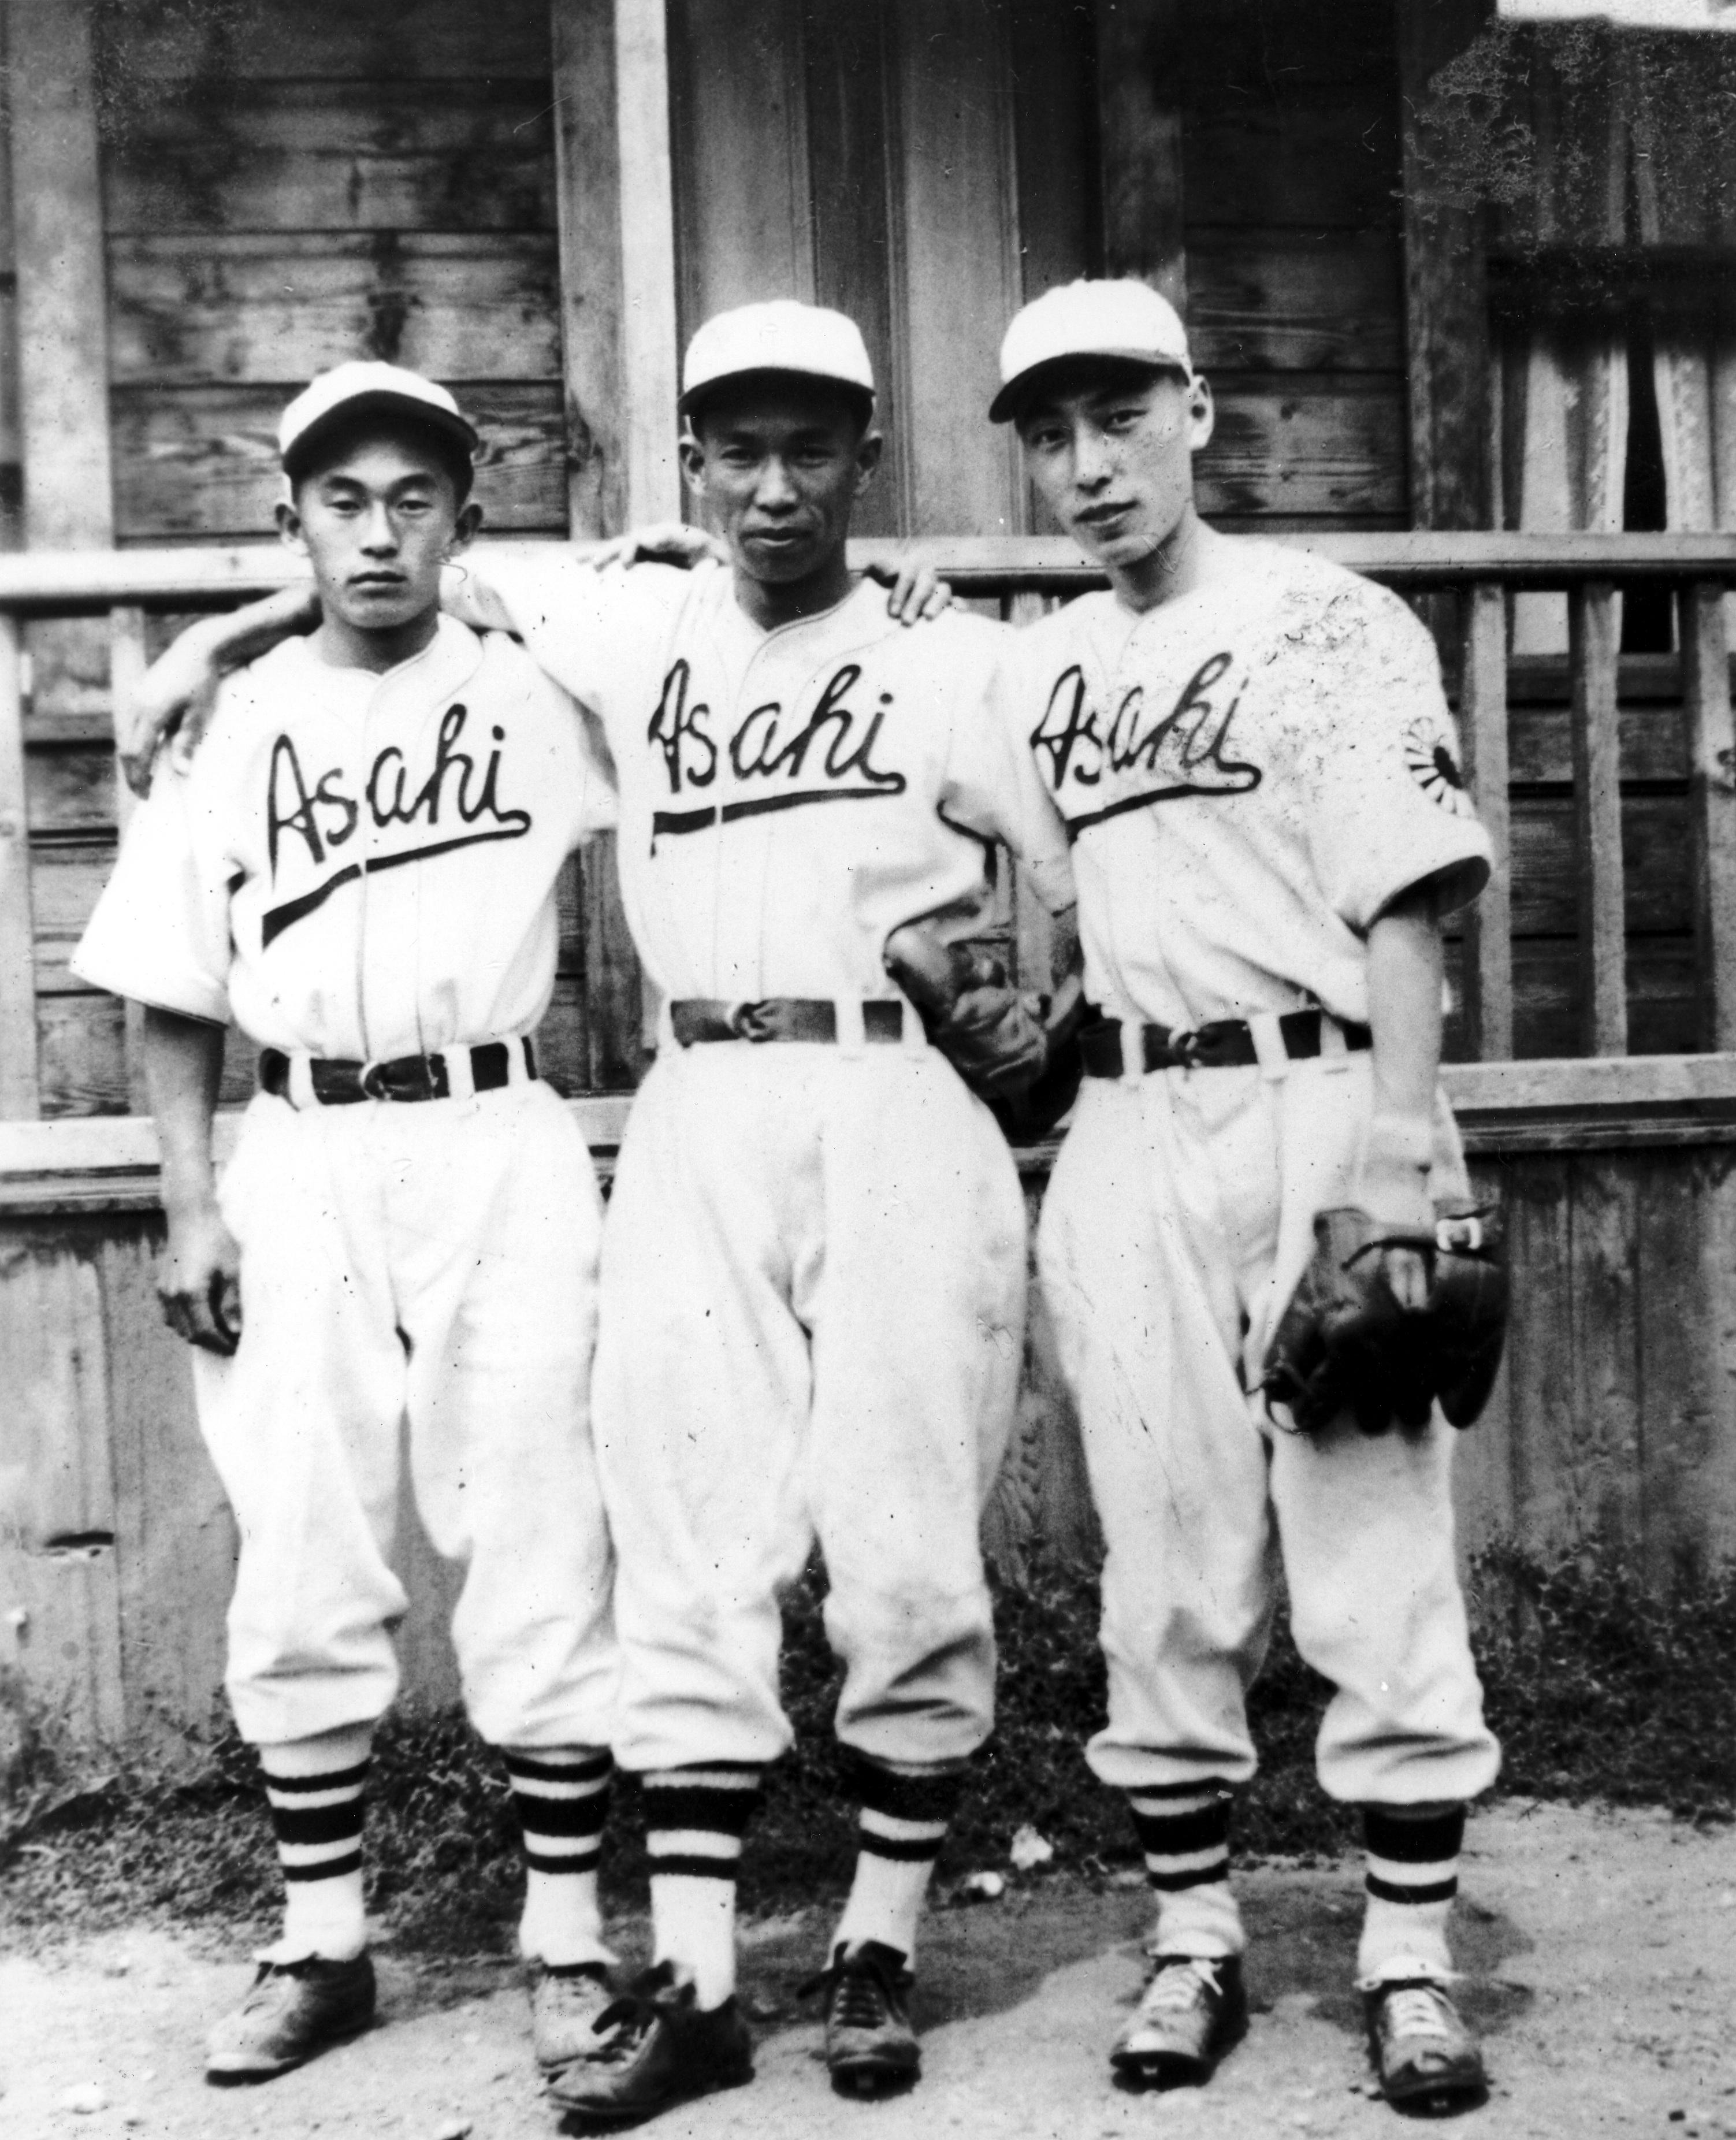 Kaye Kaminishi and Two Asahi Players